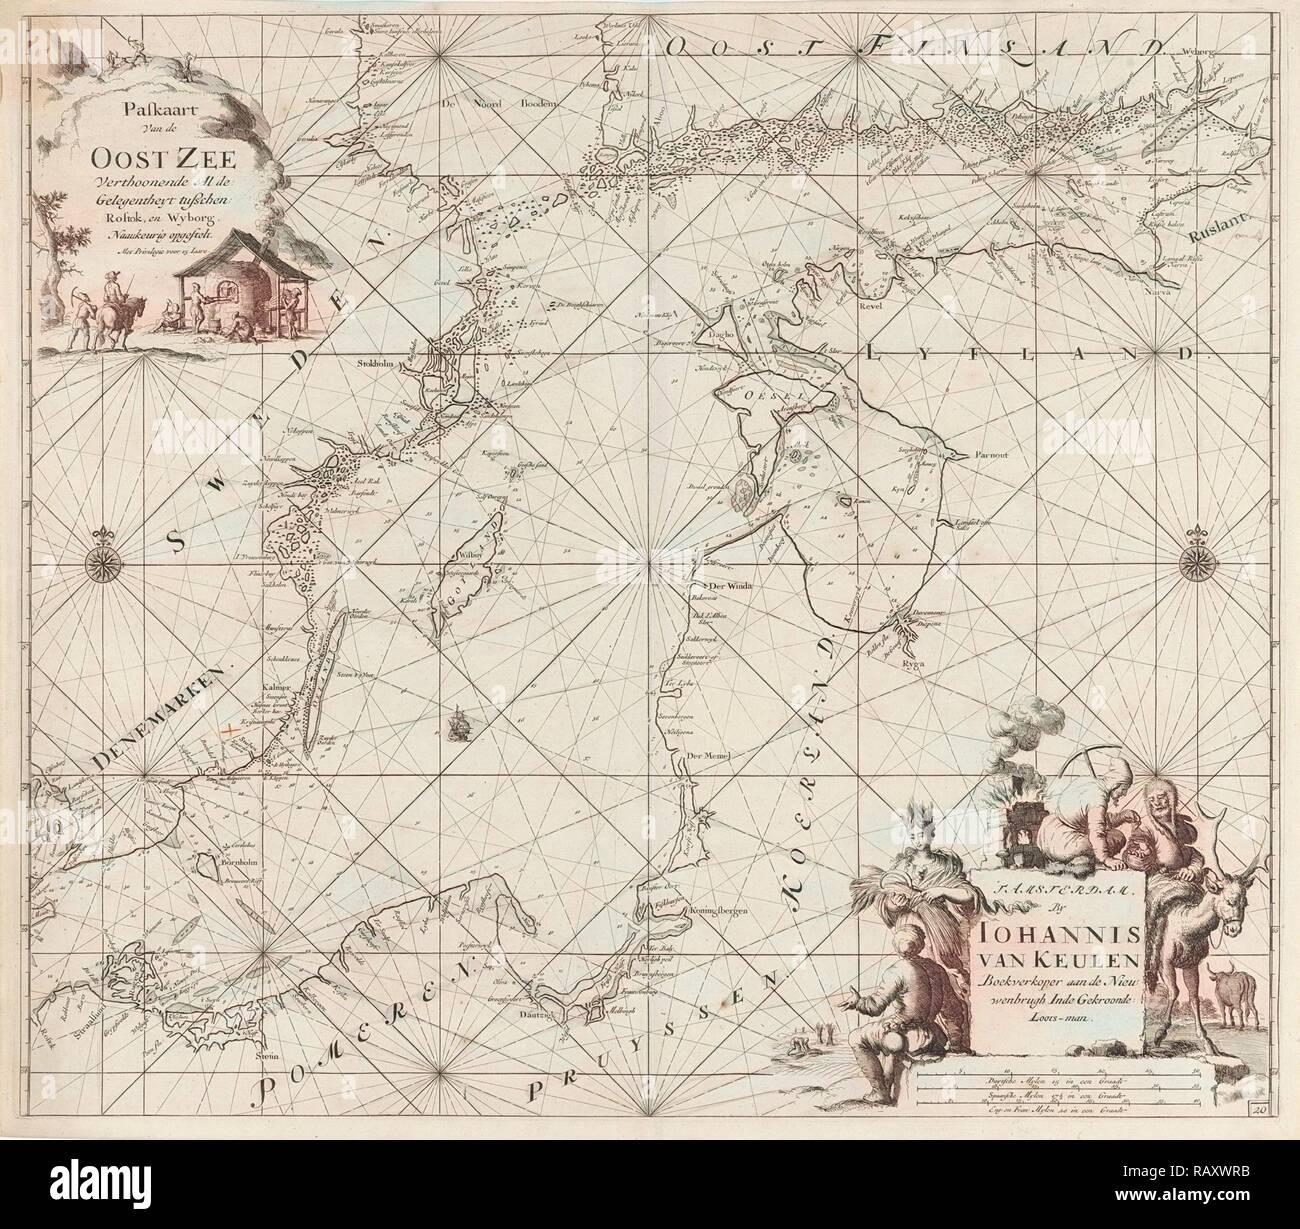 Sea chart of the Baltic Sea from Rostock to Vyborg, Jan Luyken, Johannes van Keulen (I), unknown, 1681 - 1799 reimagined Stock Photo